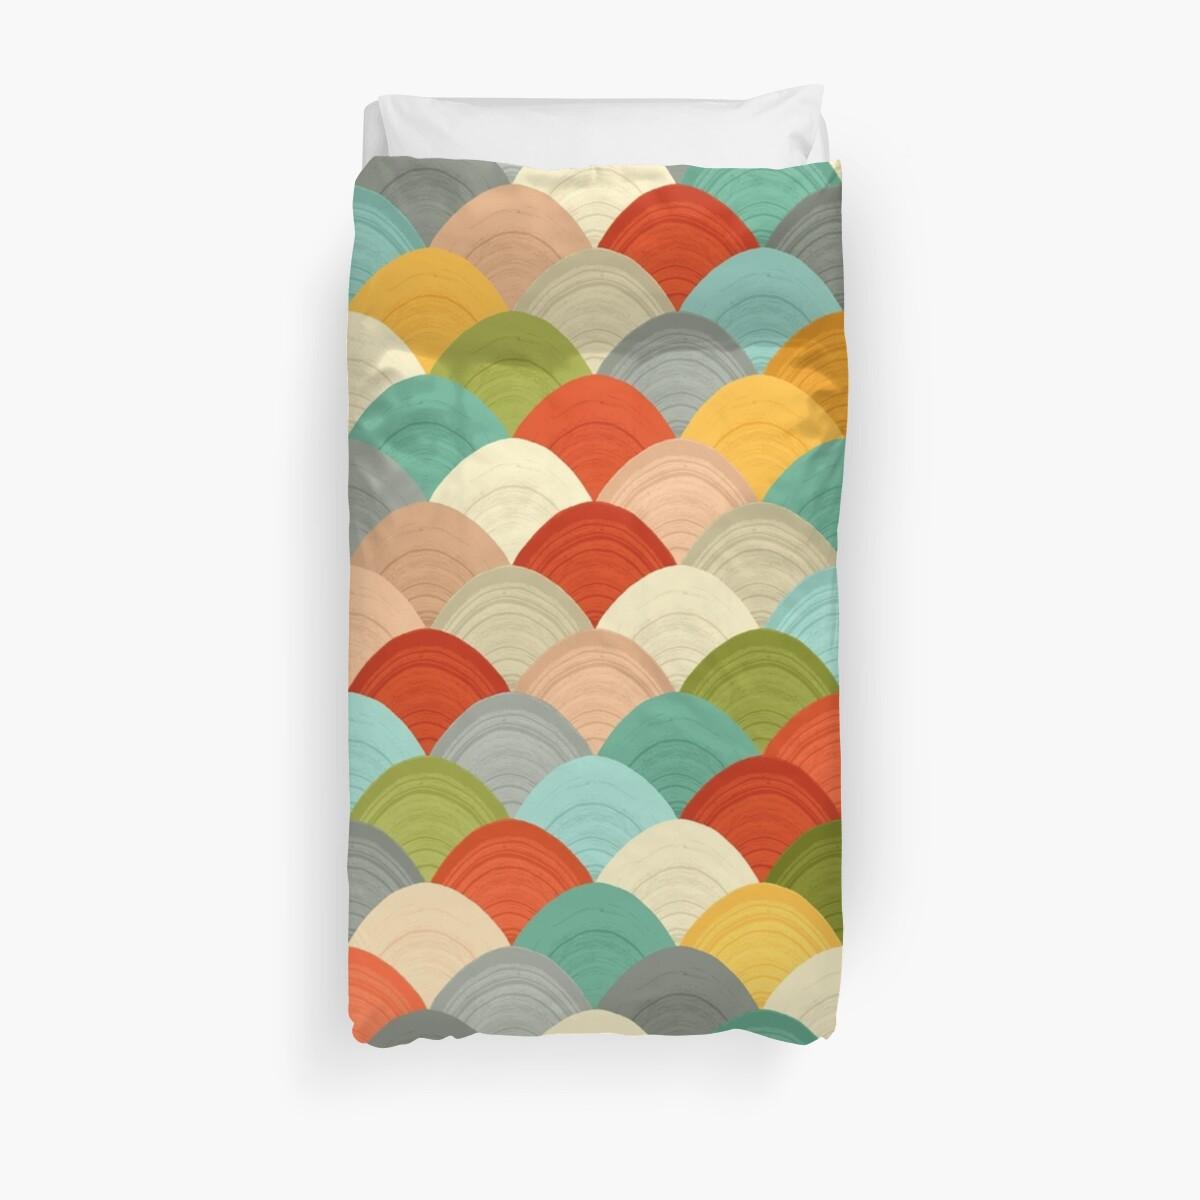 yarn hill dollops by Sharon Turner